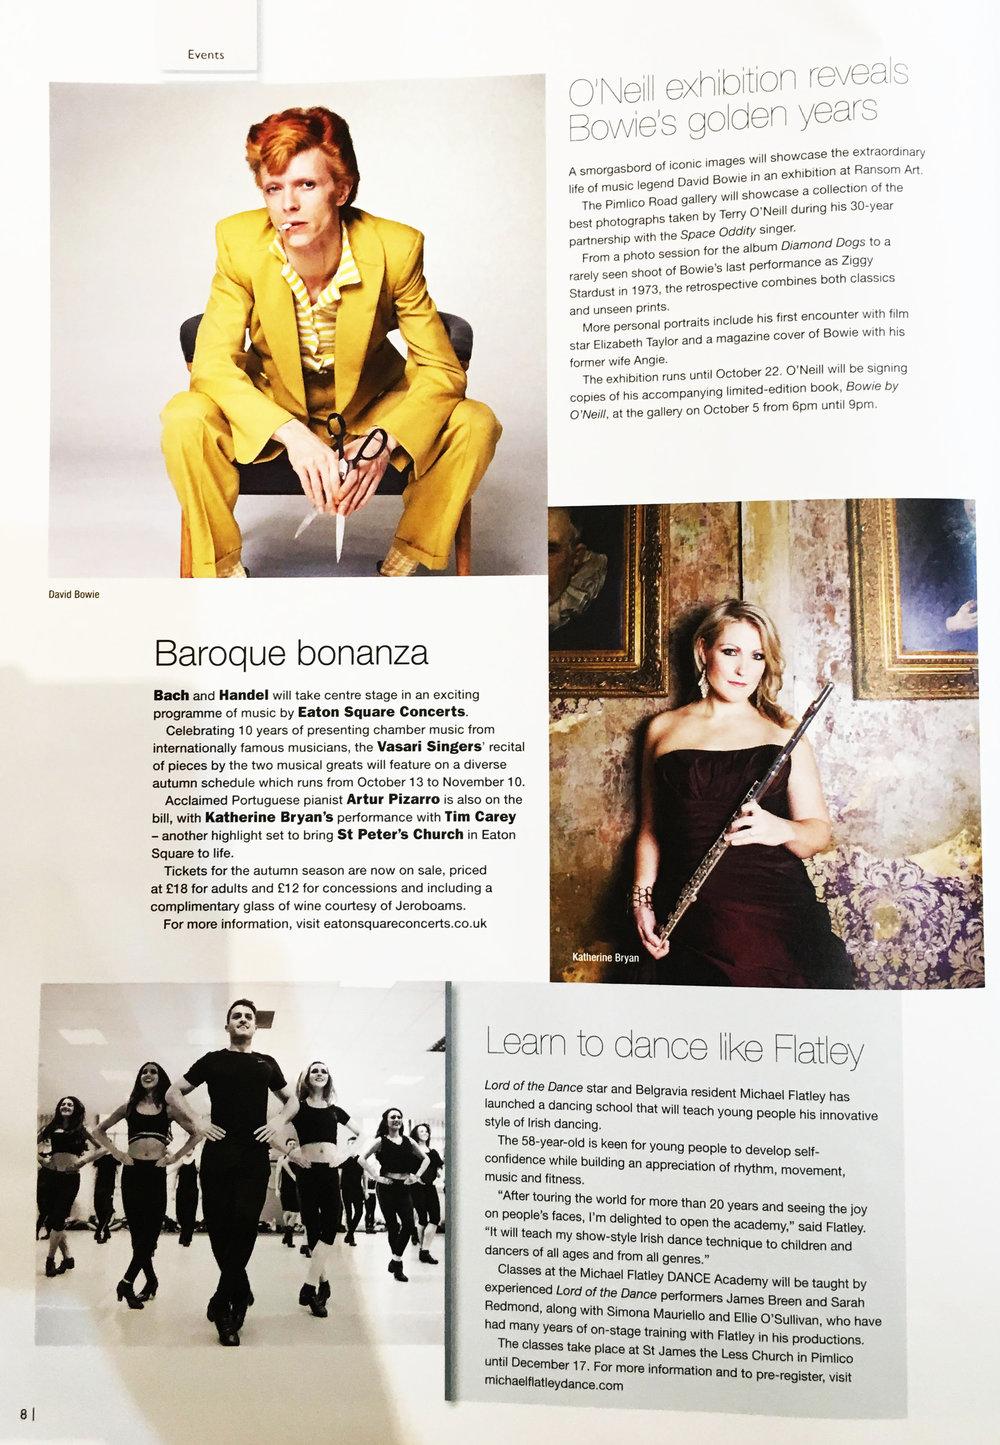 Belgravia Magazine - David Bowie Exhibition at Ransom Art